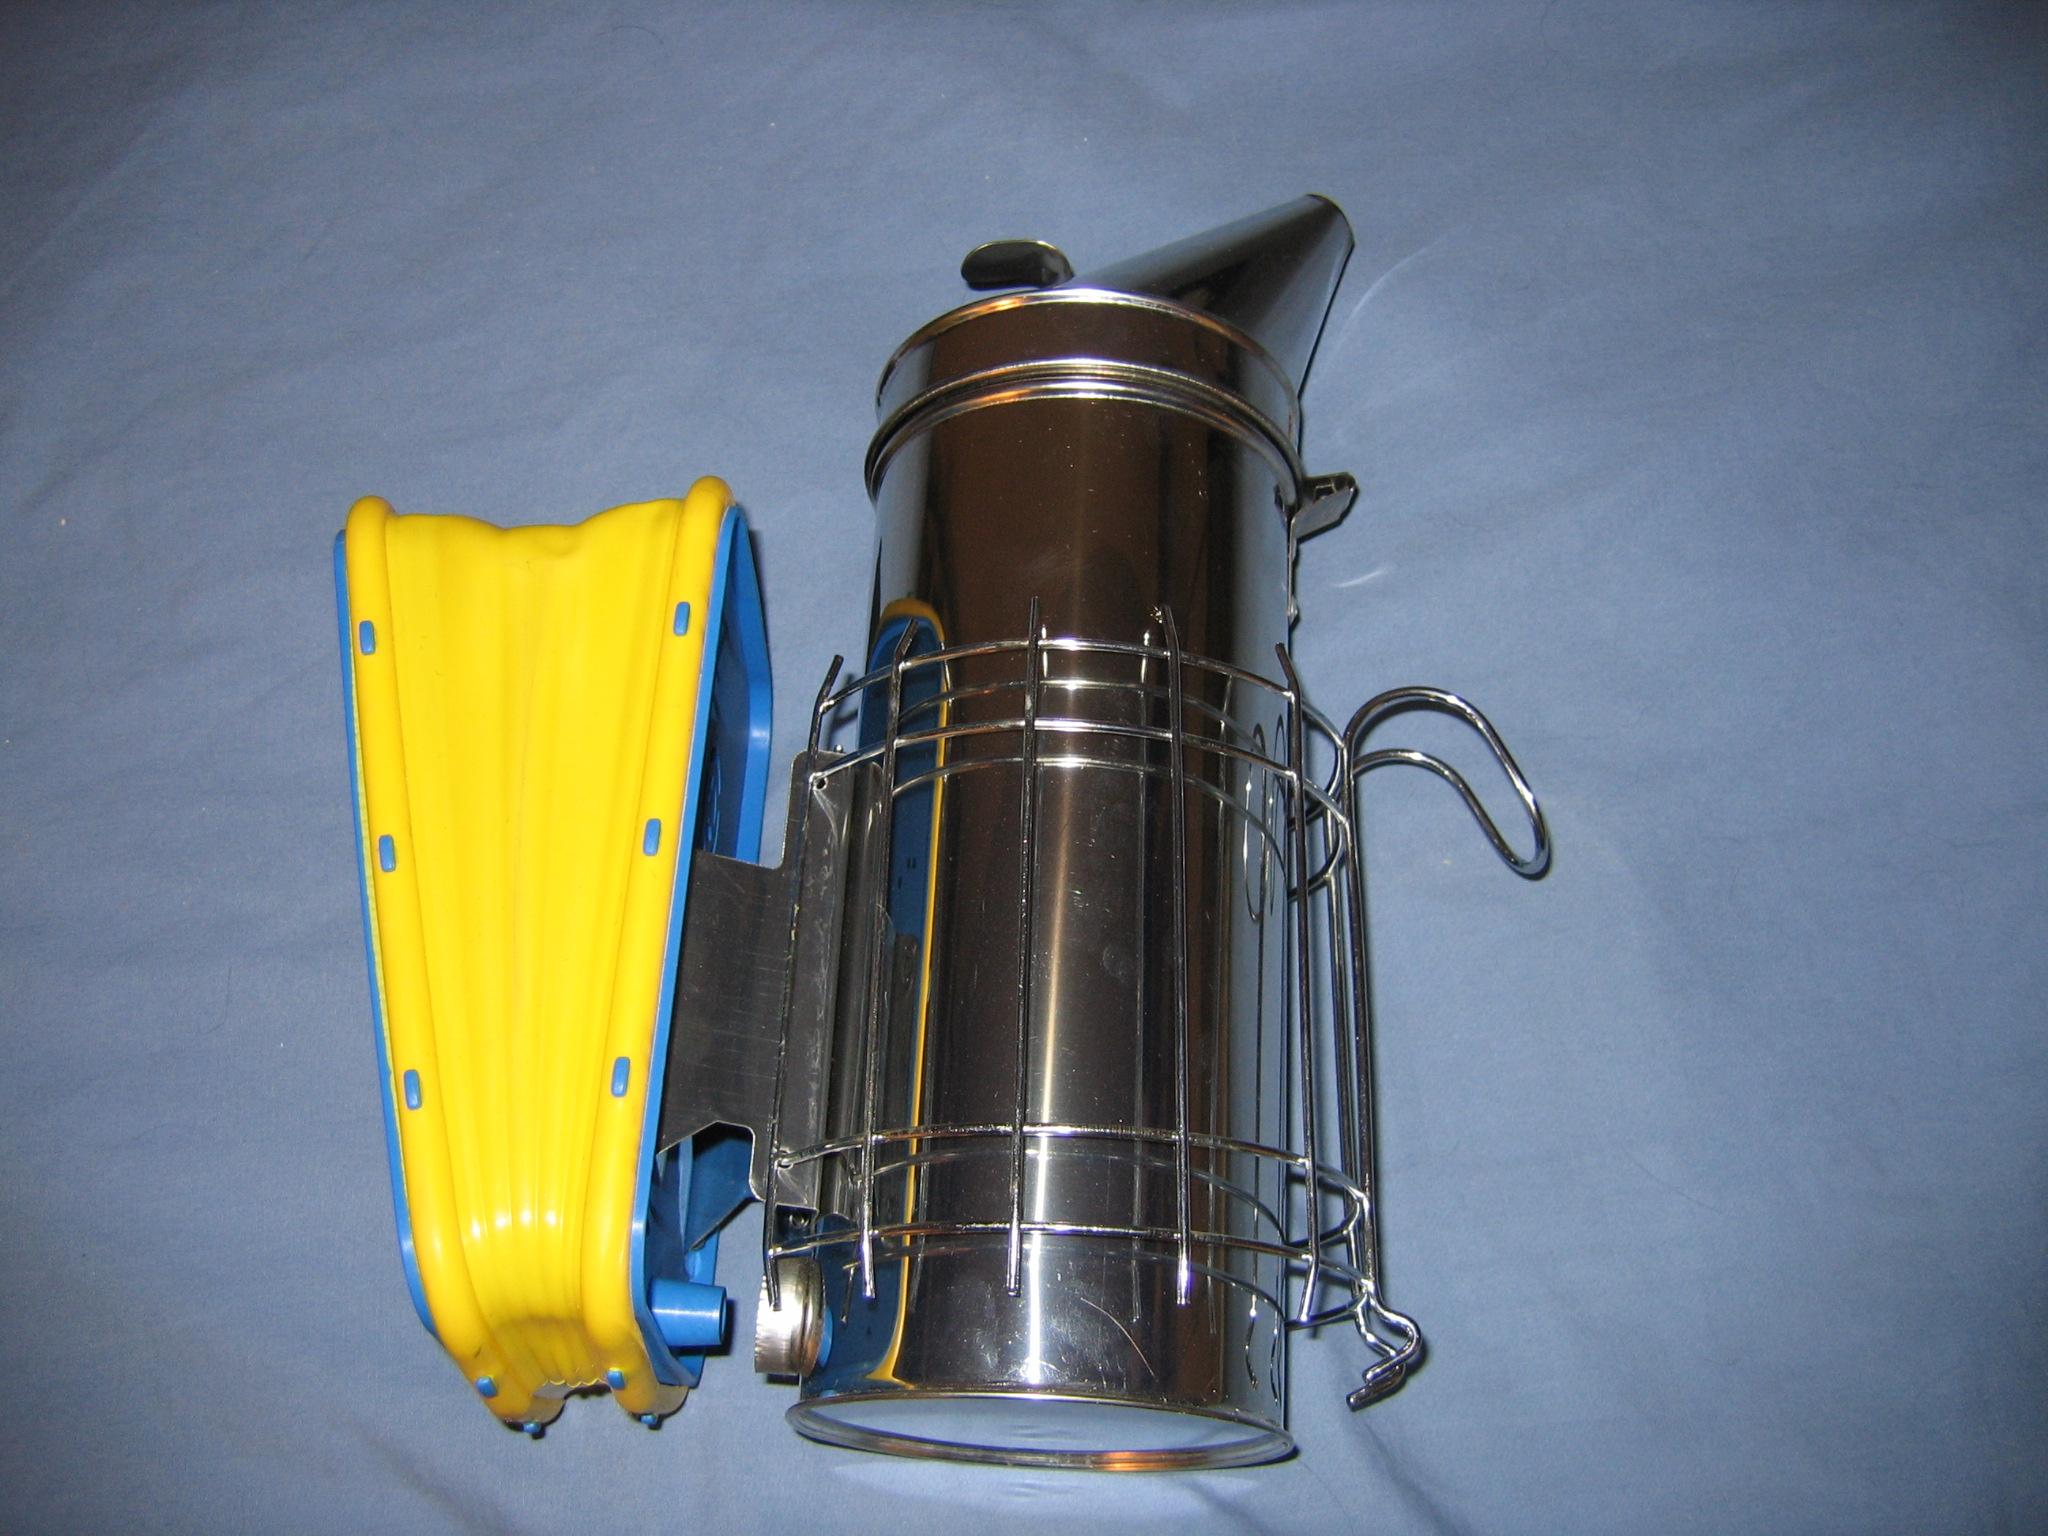 File:Beekeeping smoker.jpg - Wikimedia Commons